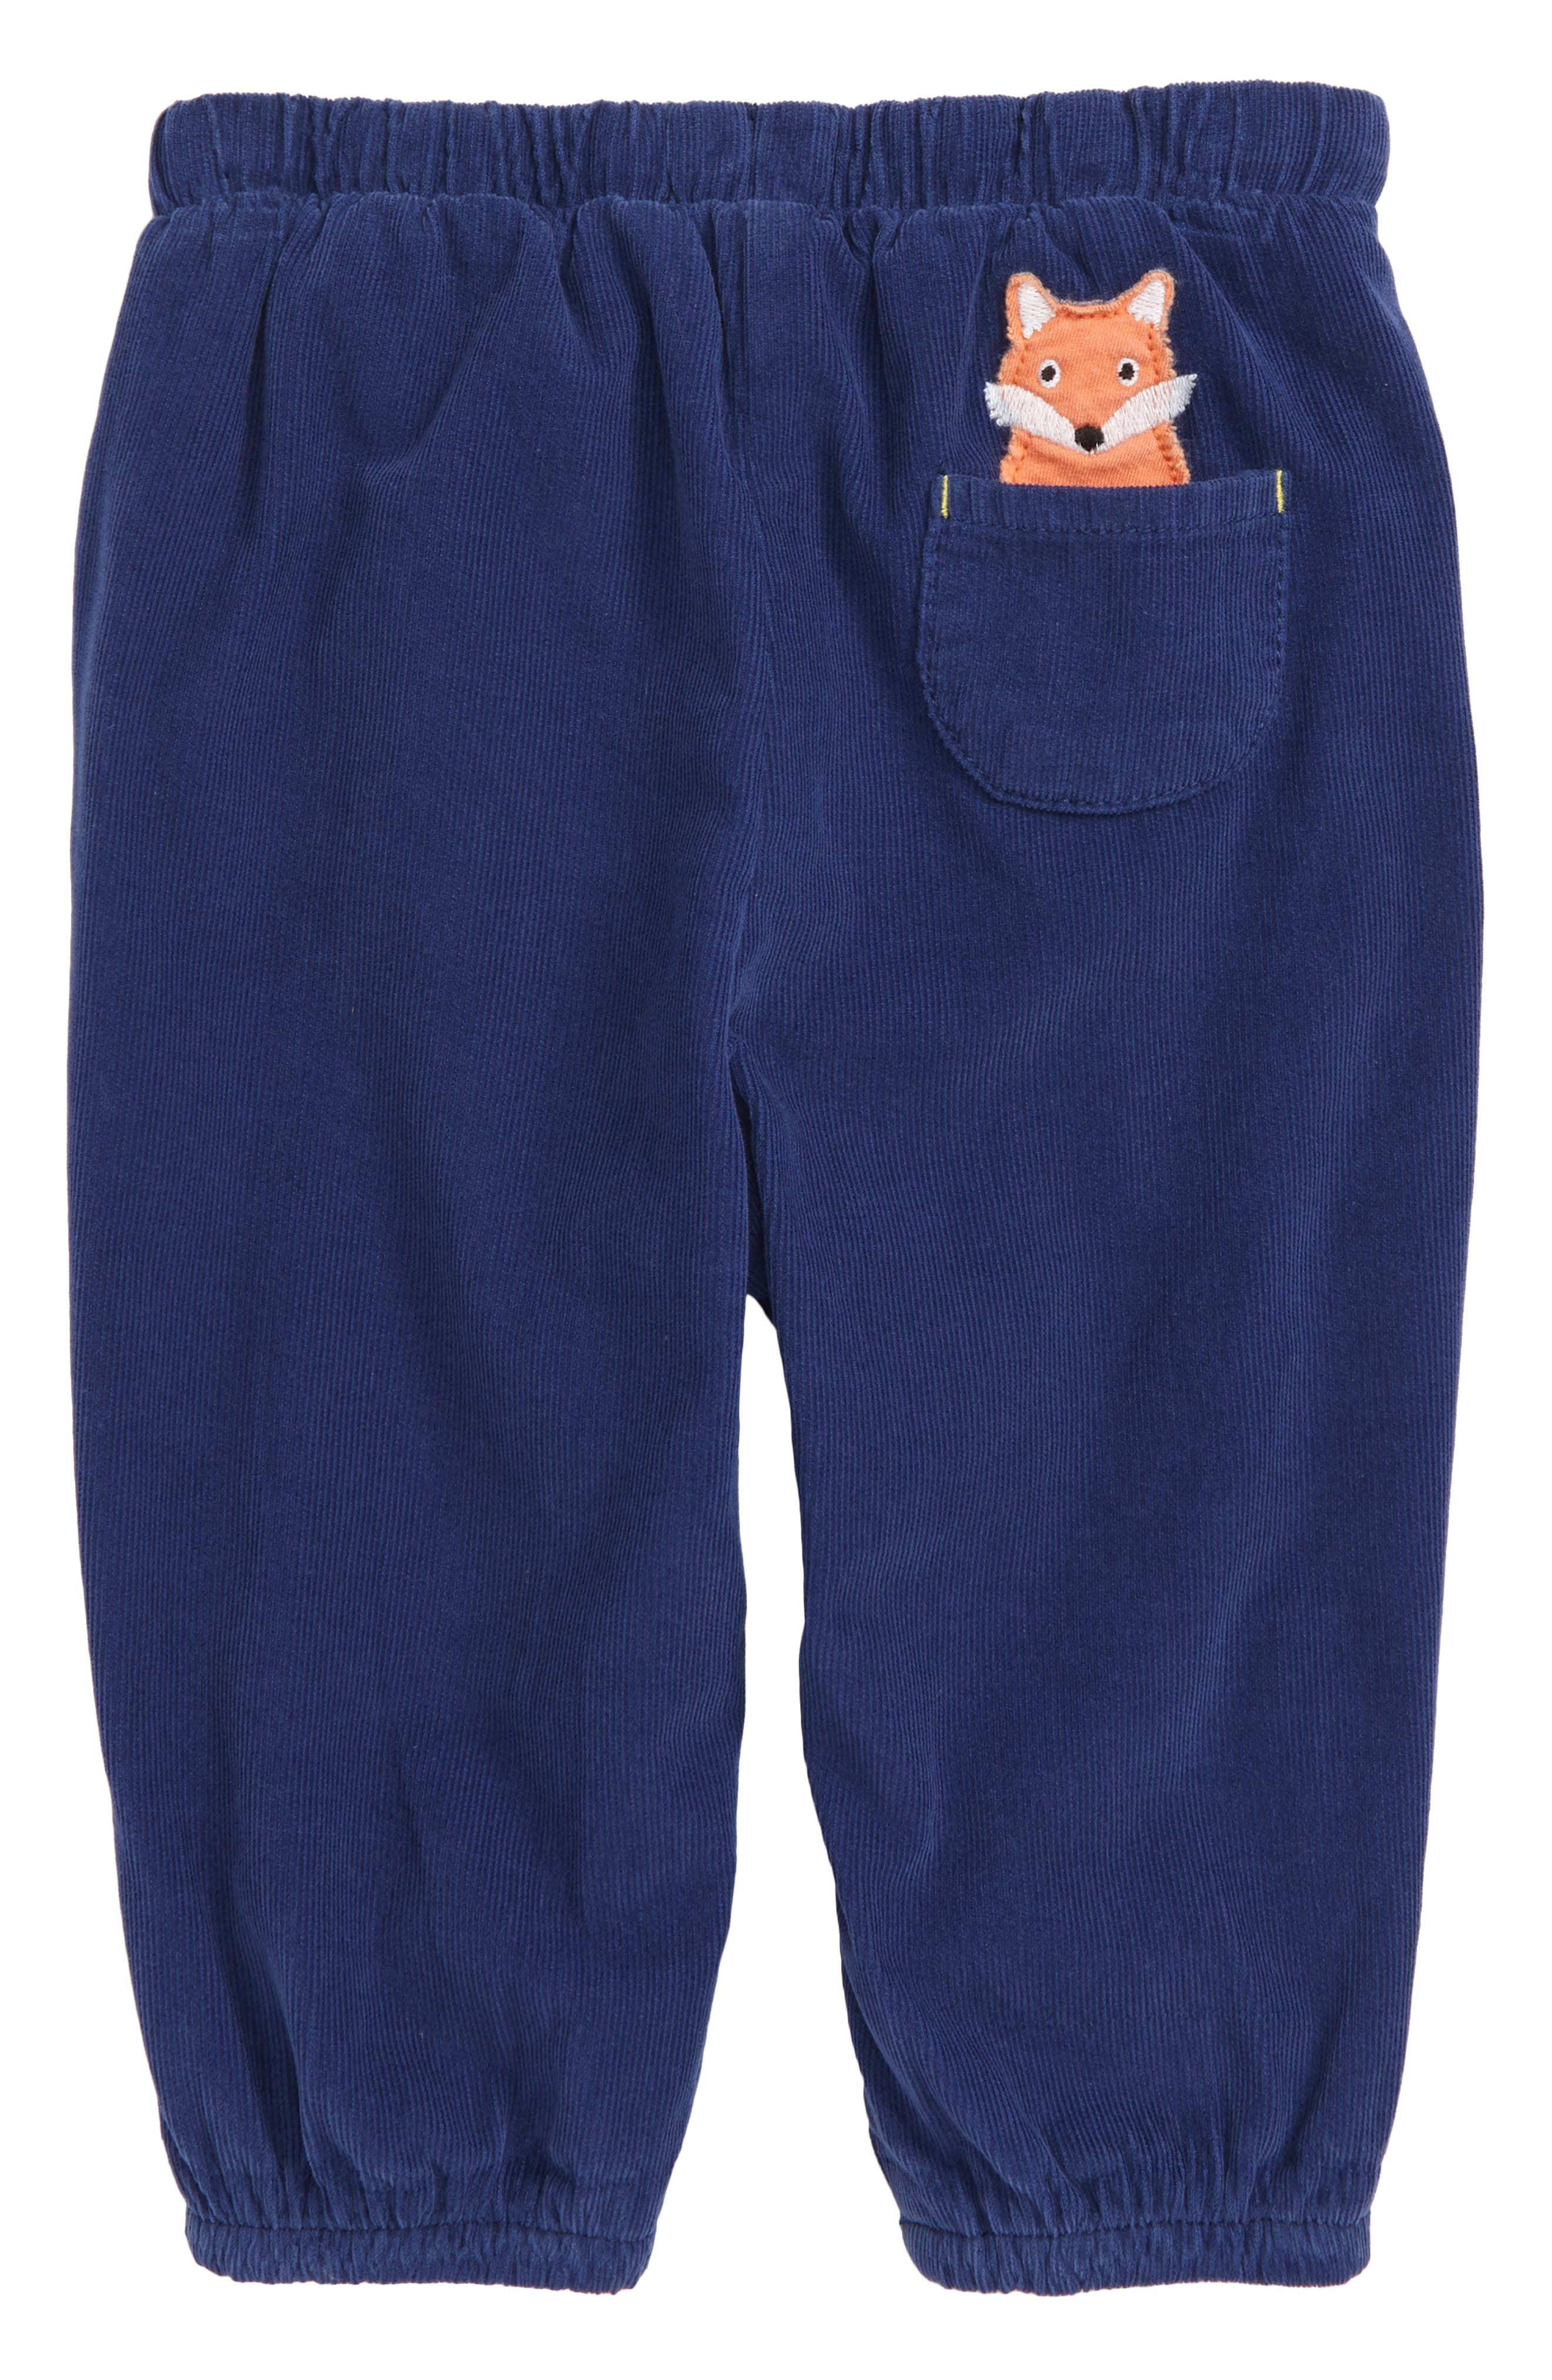 Pocket Pet Corduroy Pants,                             Alternate thumbnail 2, color,                             404